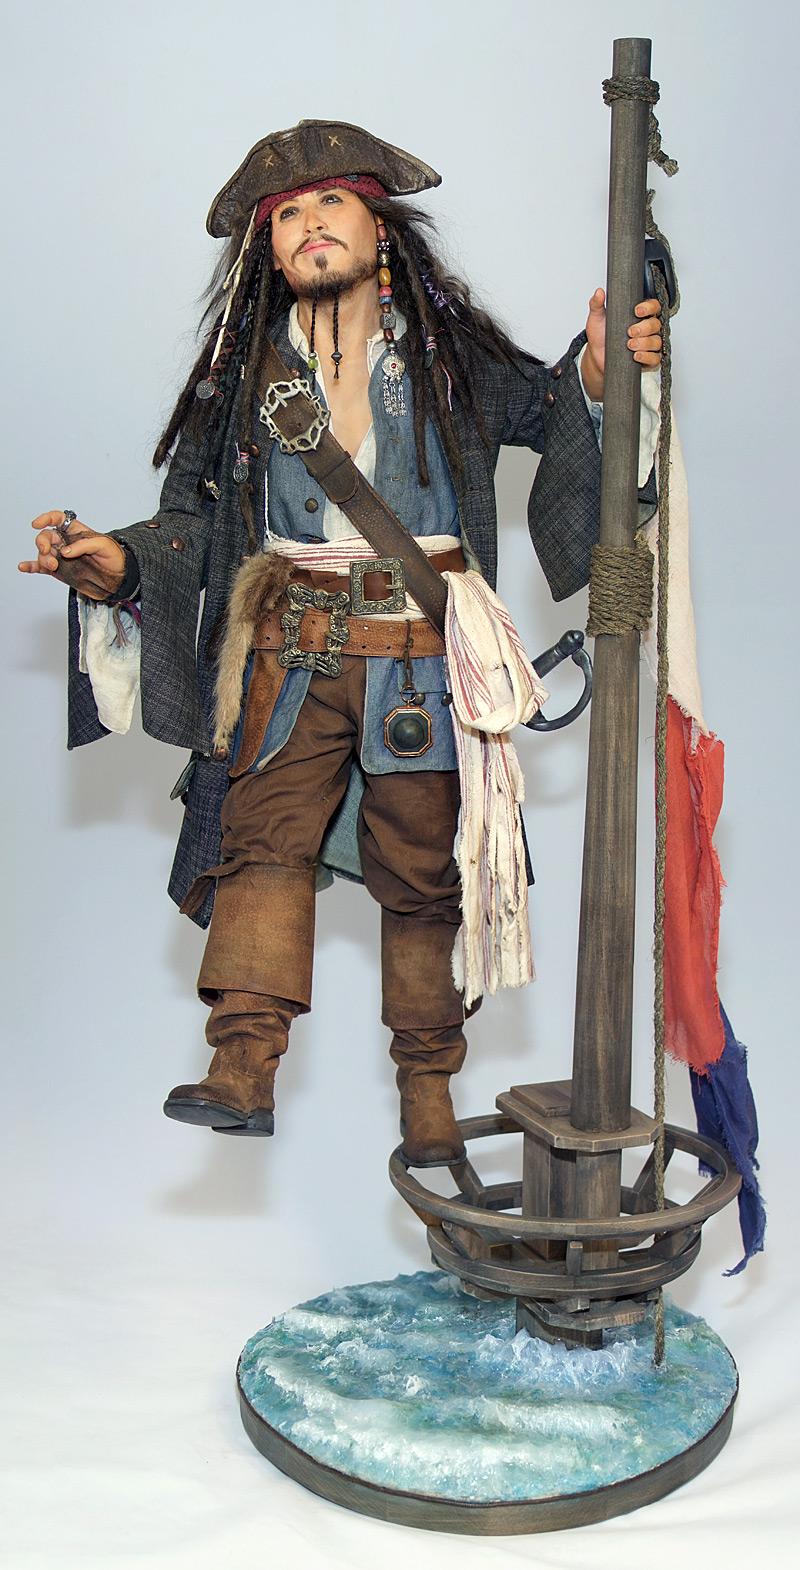 Капитан Джек Воробей II, 2011 год (общий вид)